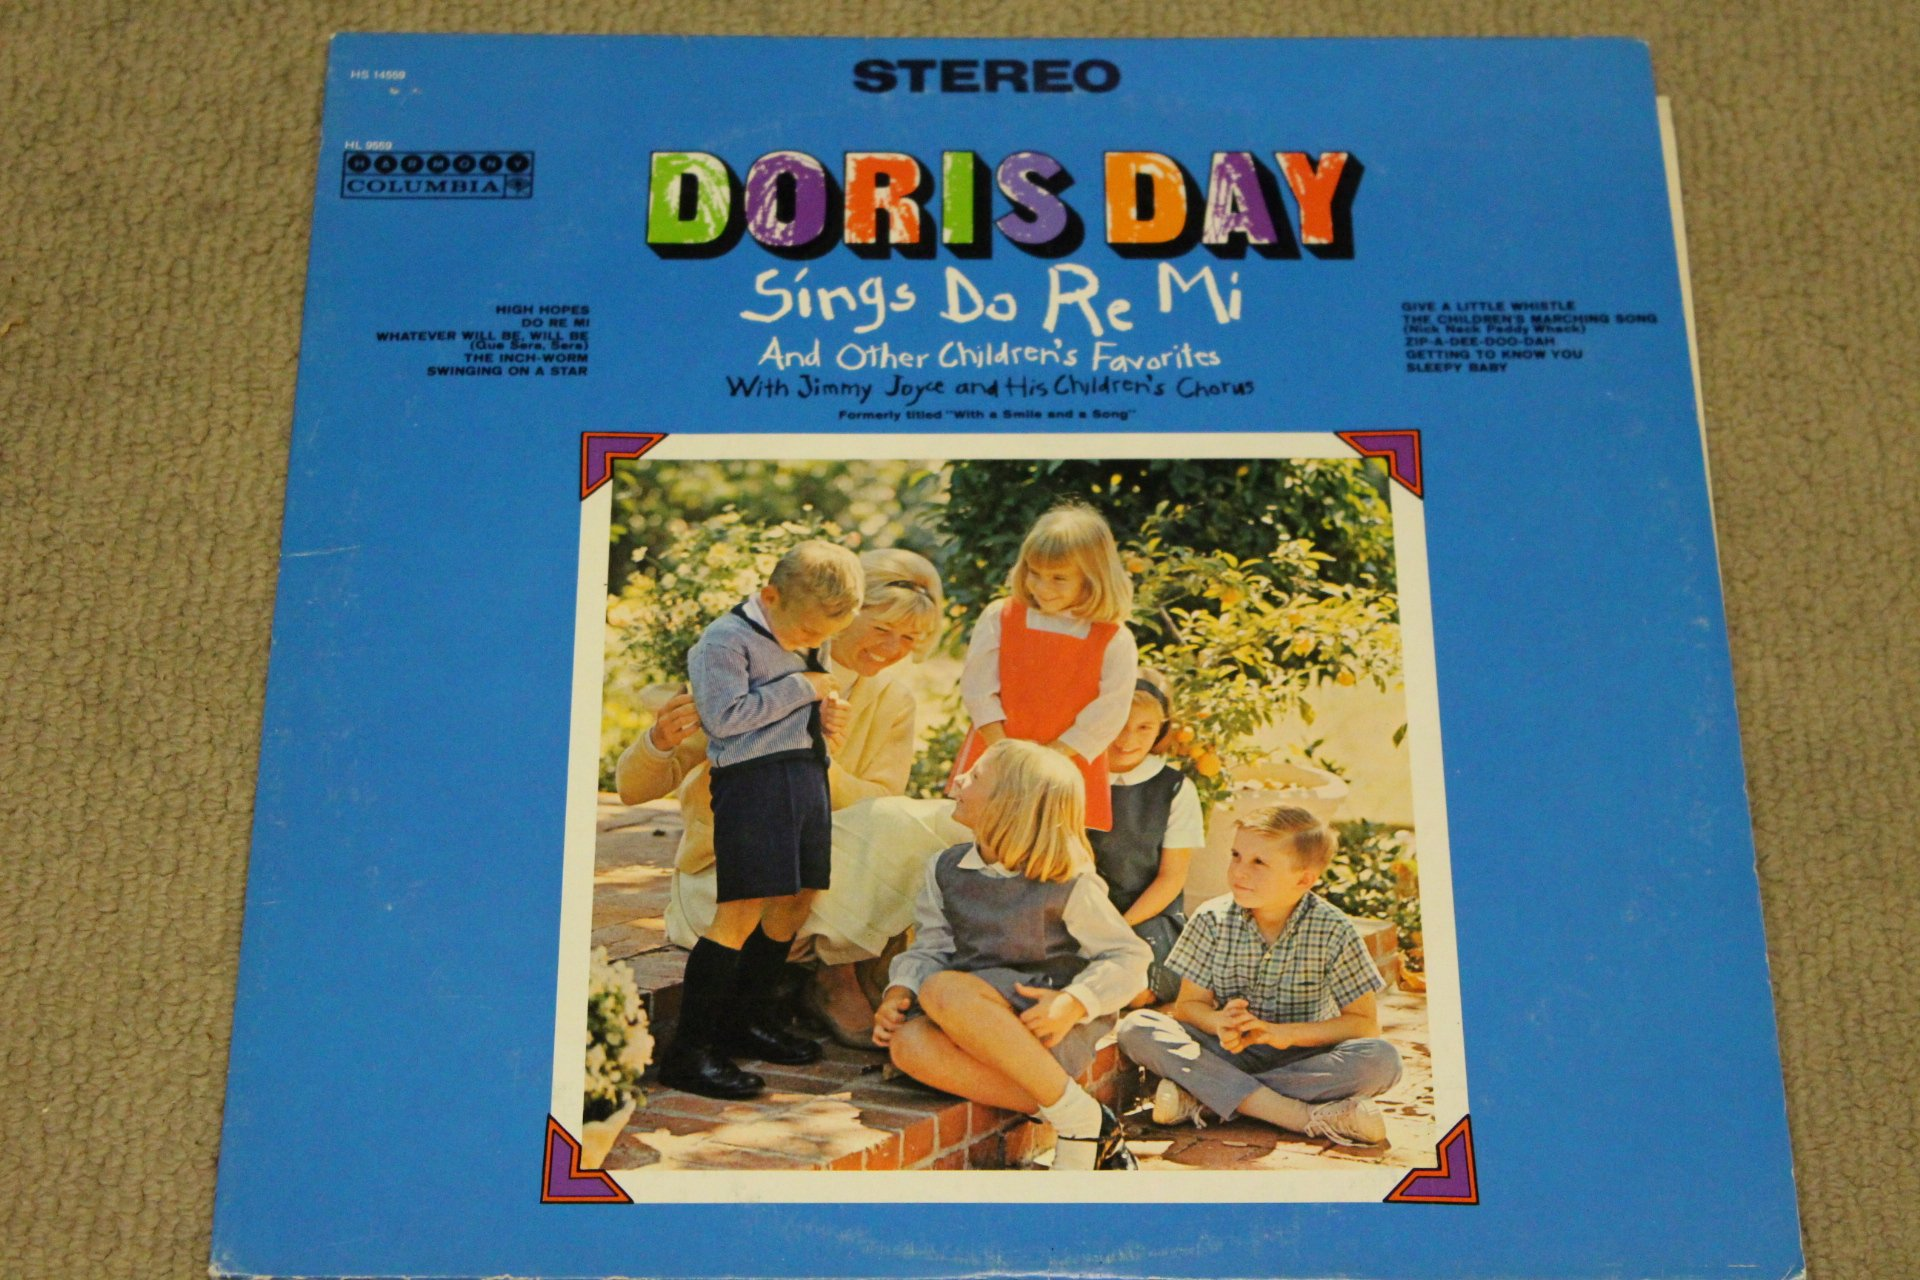 Doris Day: Sings Do Re Mi And Other Children's Favorites [VINYL LP] [STEREO]